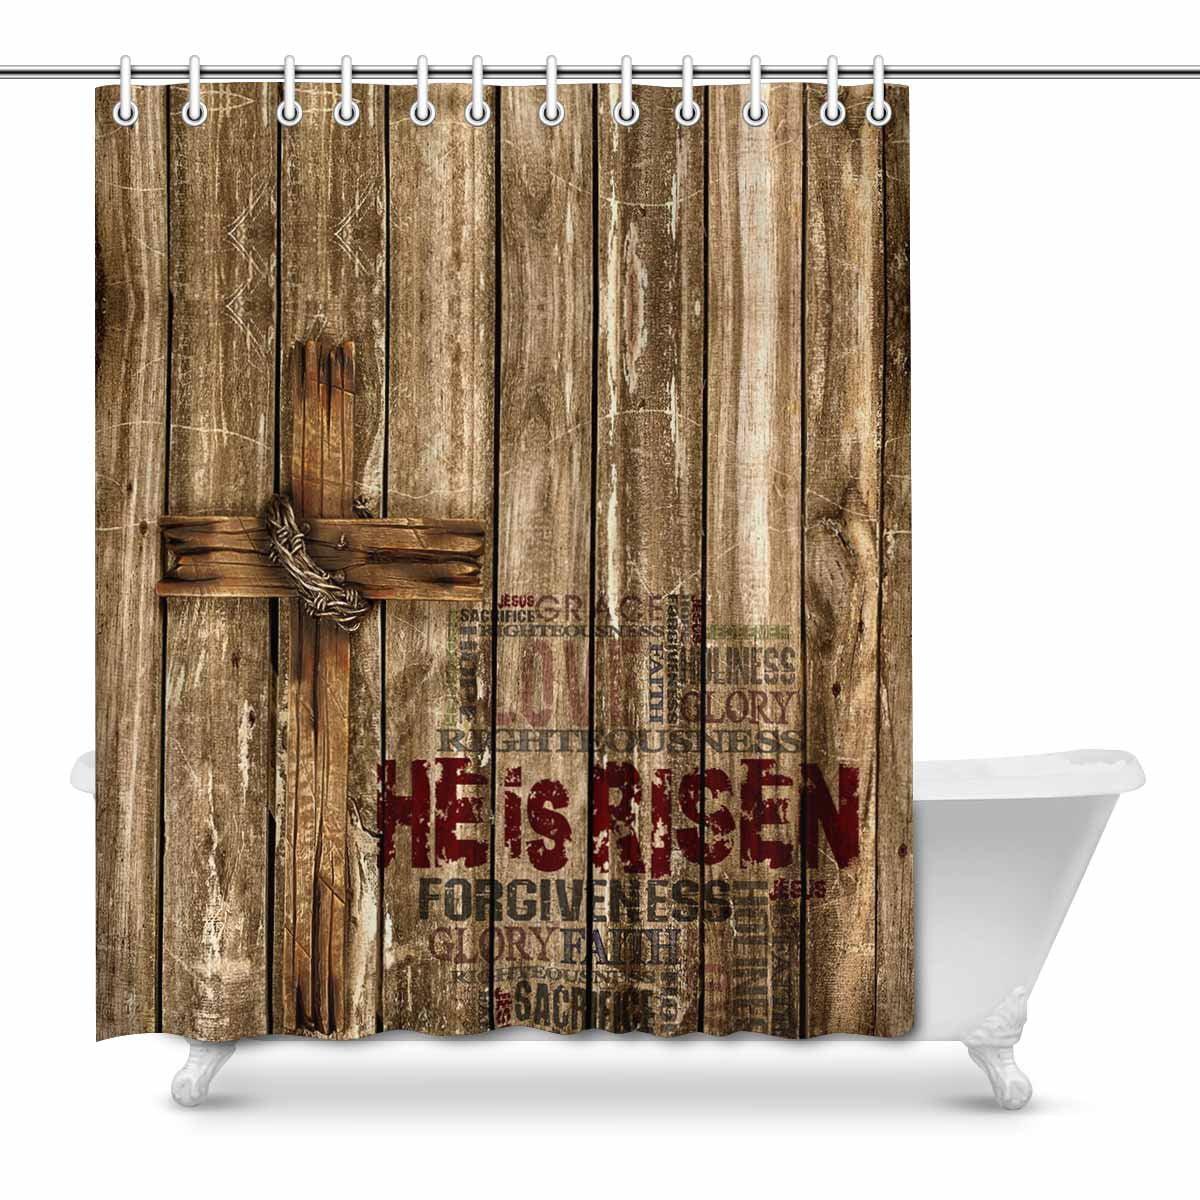 Mkhert He Is Risen Easter With Christian Cross On Wood Design Home Decor Waterproof Polyester Bathroom Shower Curtain Bath 66x72 Inch Walmart Com